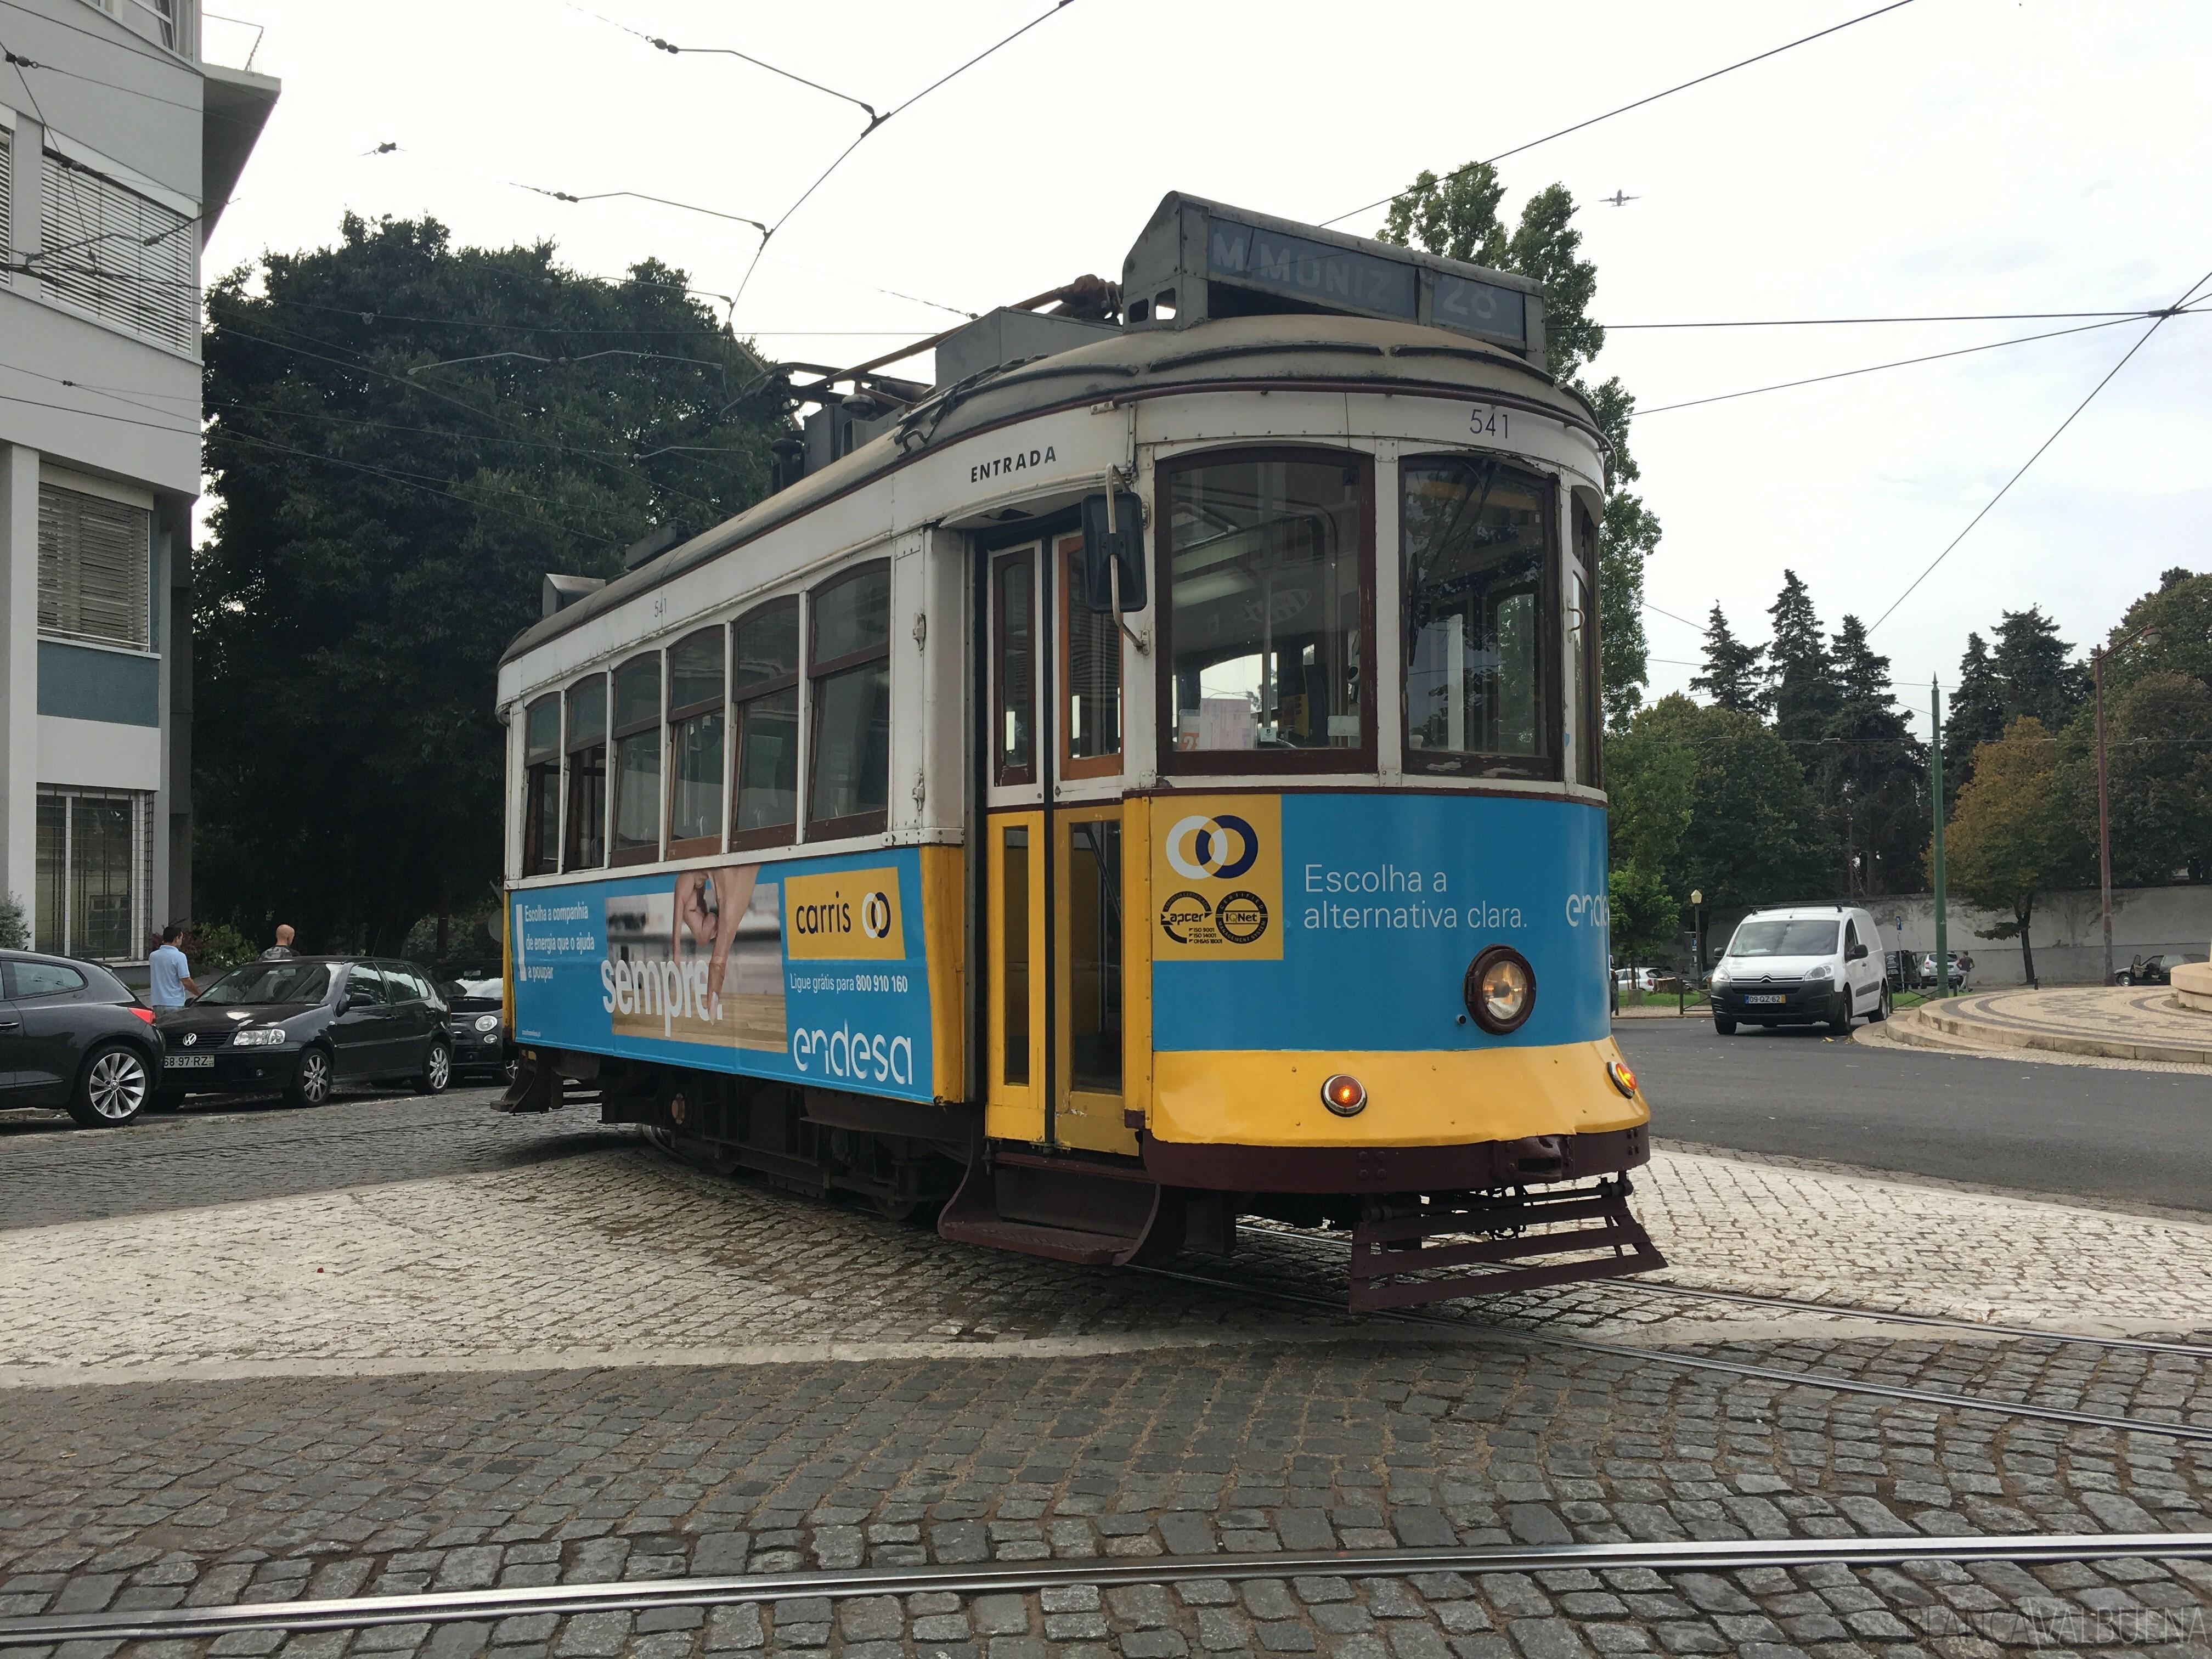 Take tram 28 to get to Prazeres Cemetery